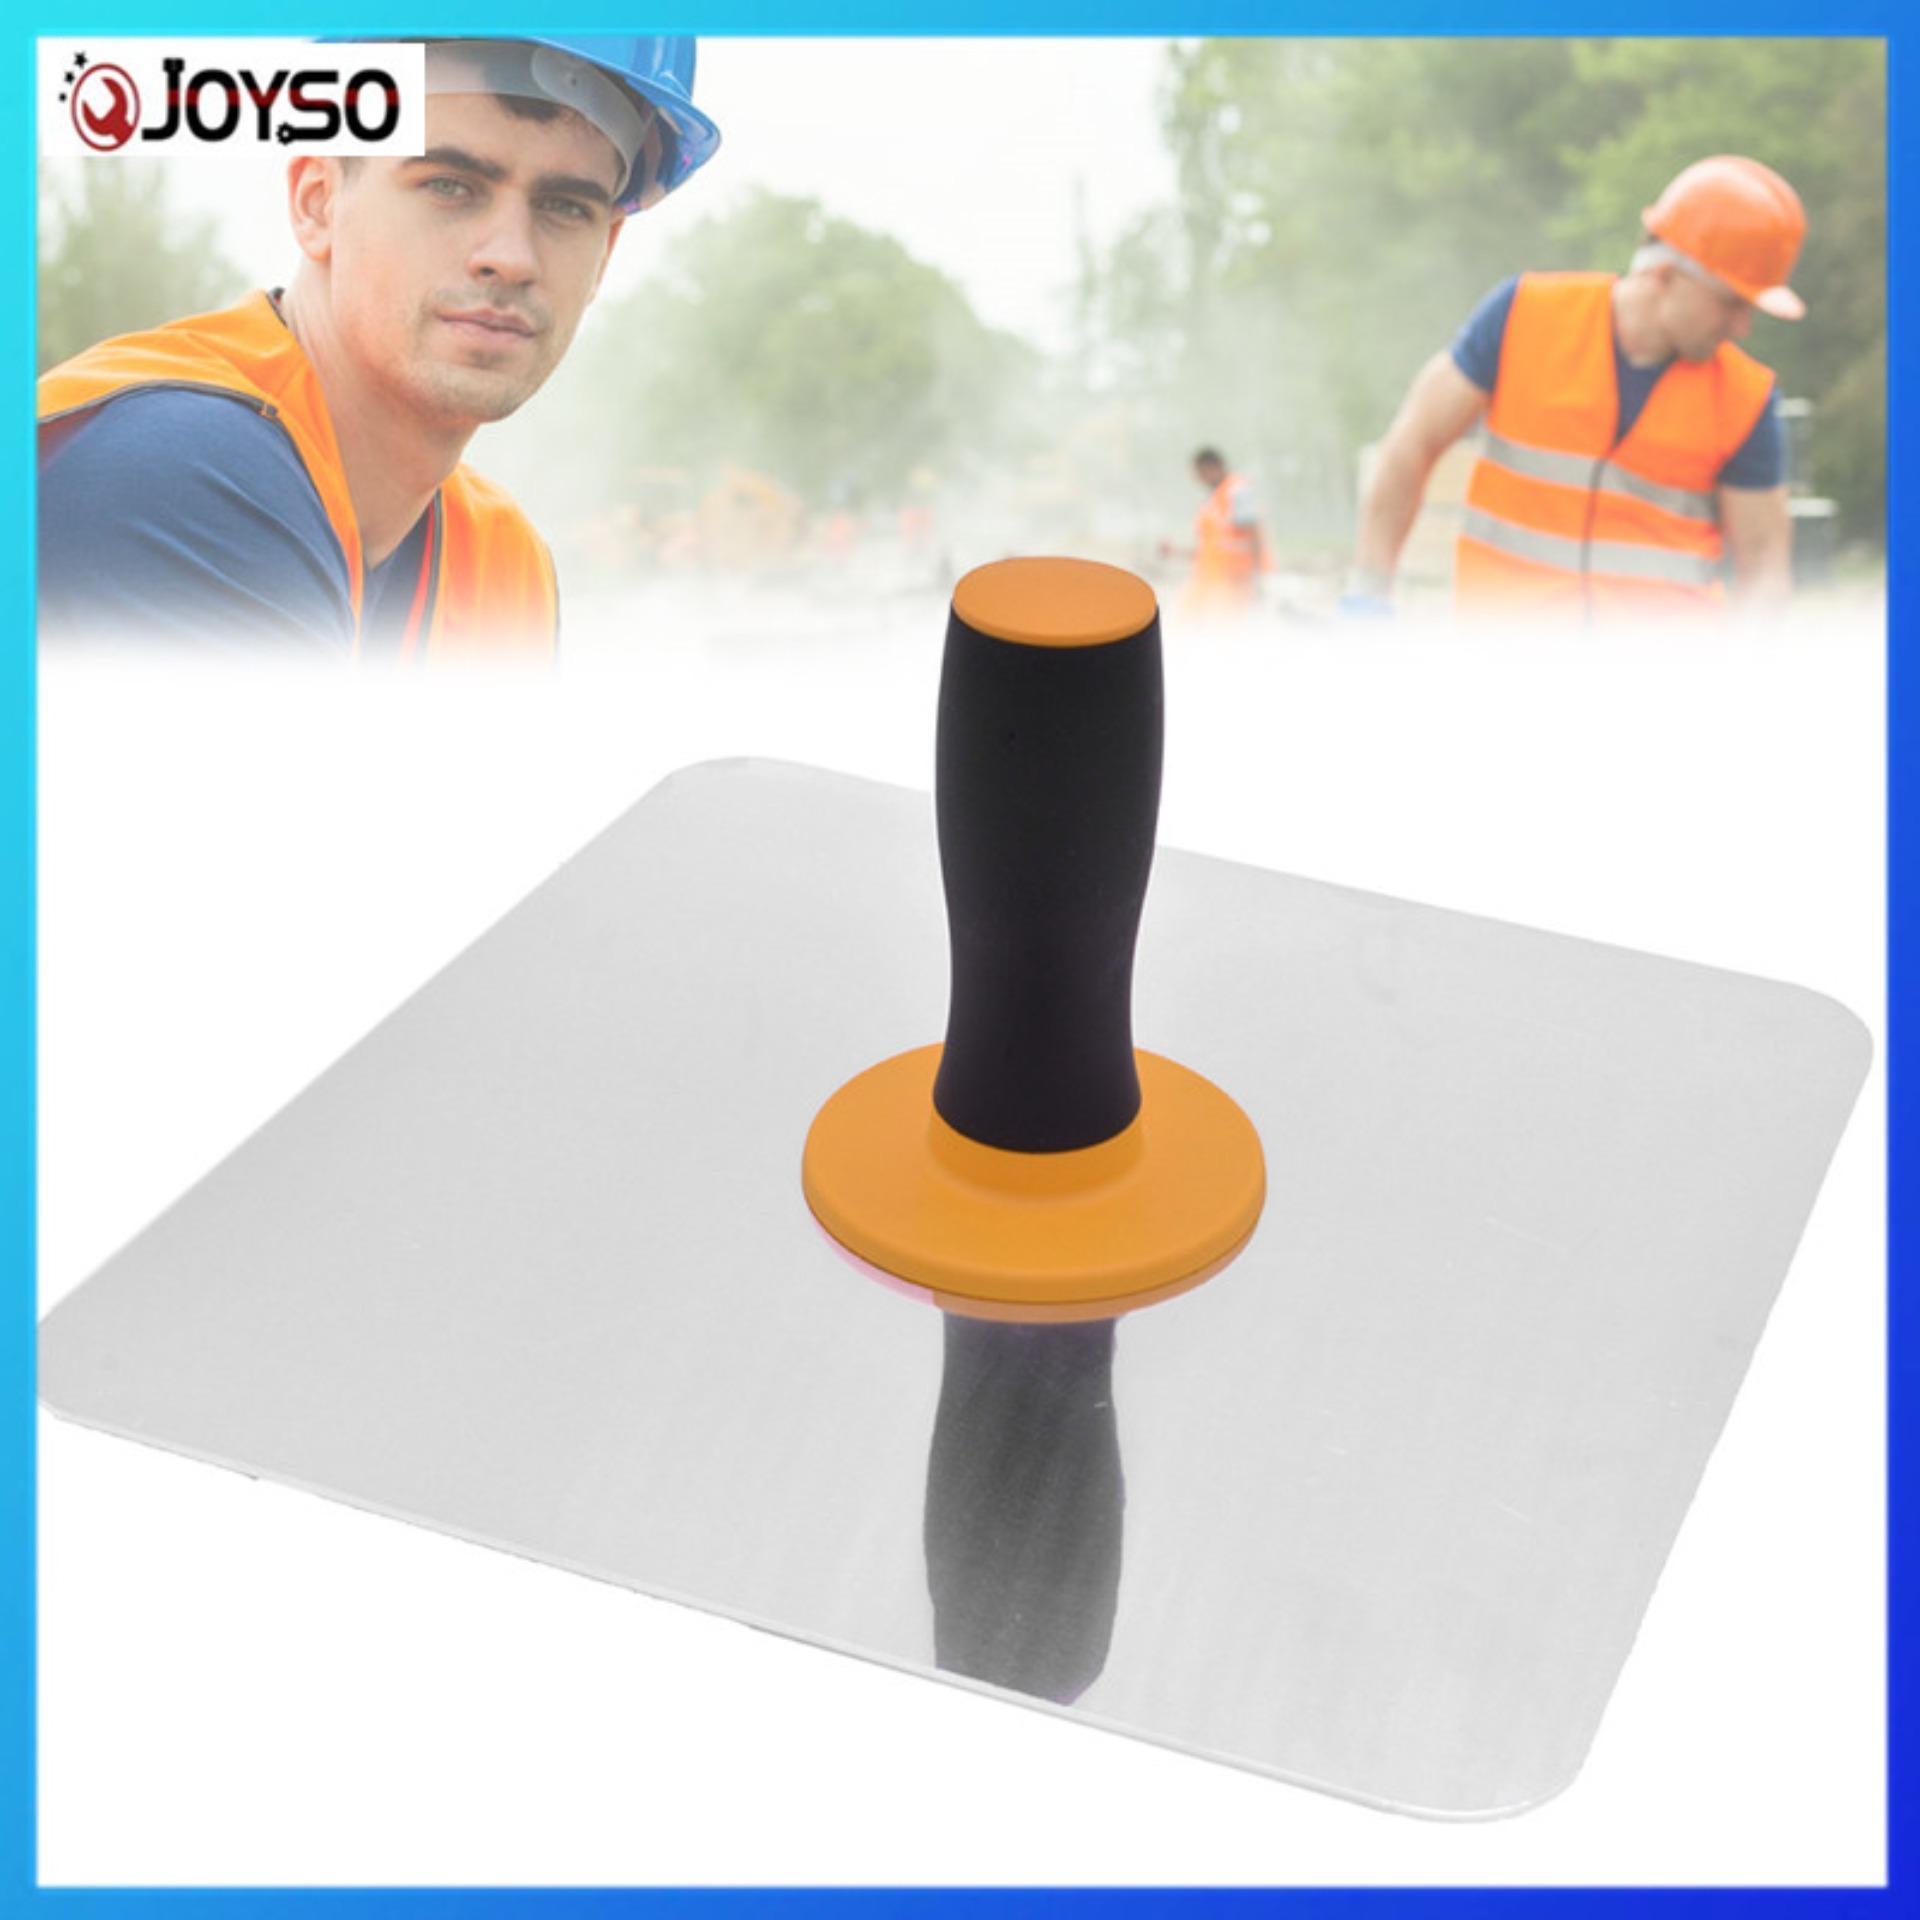 JOYSO Aluminium Trowel Mortar Board Holder Construction with Handle Plastering Tool